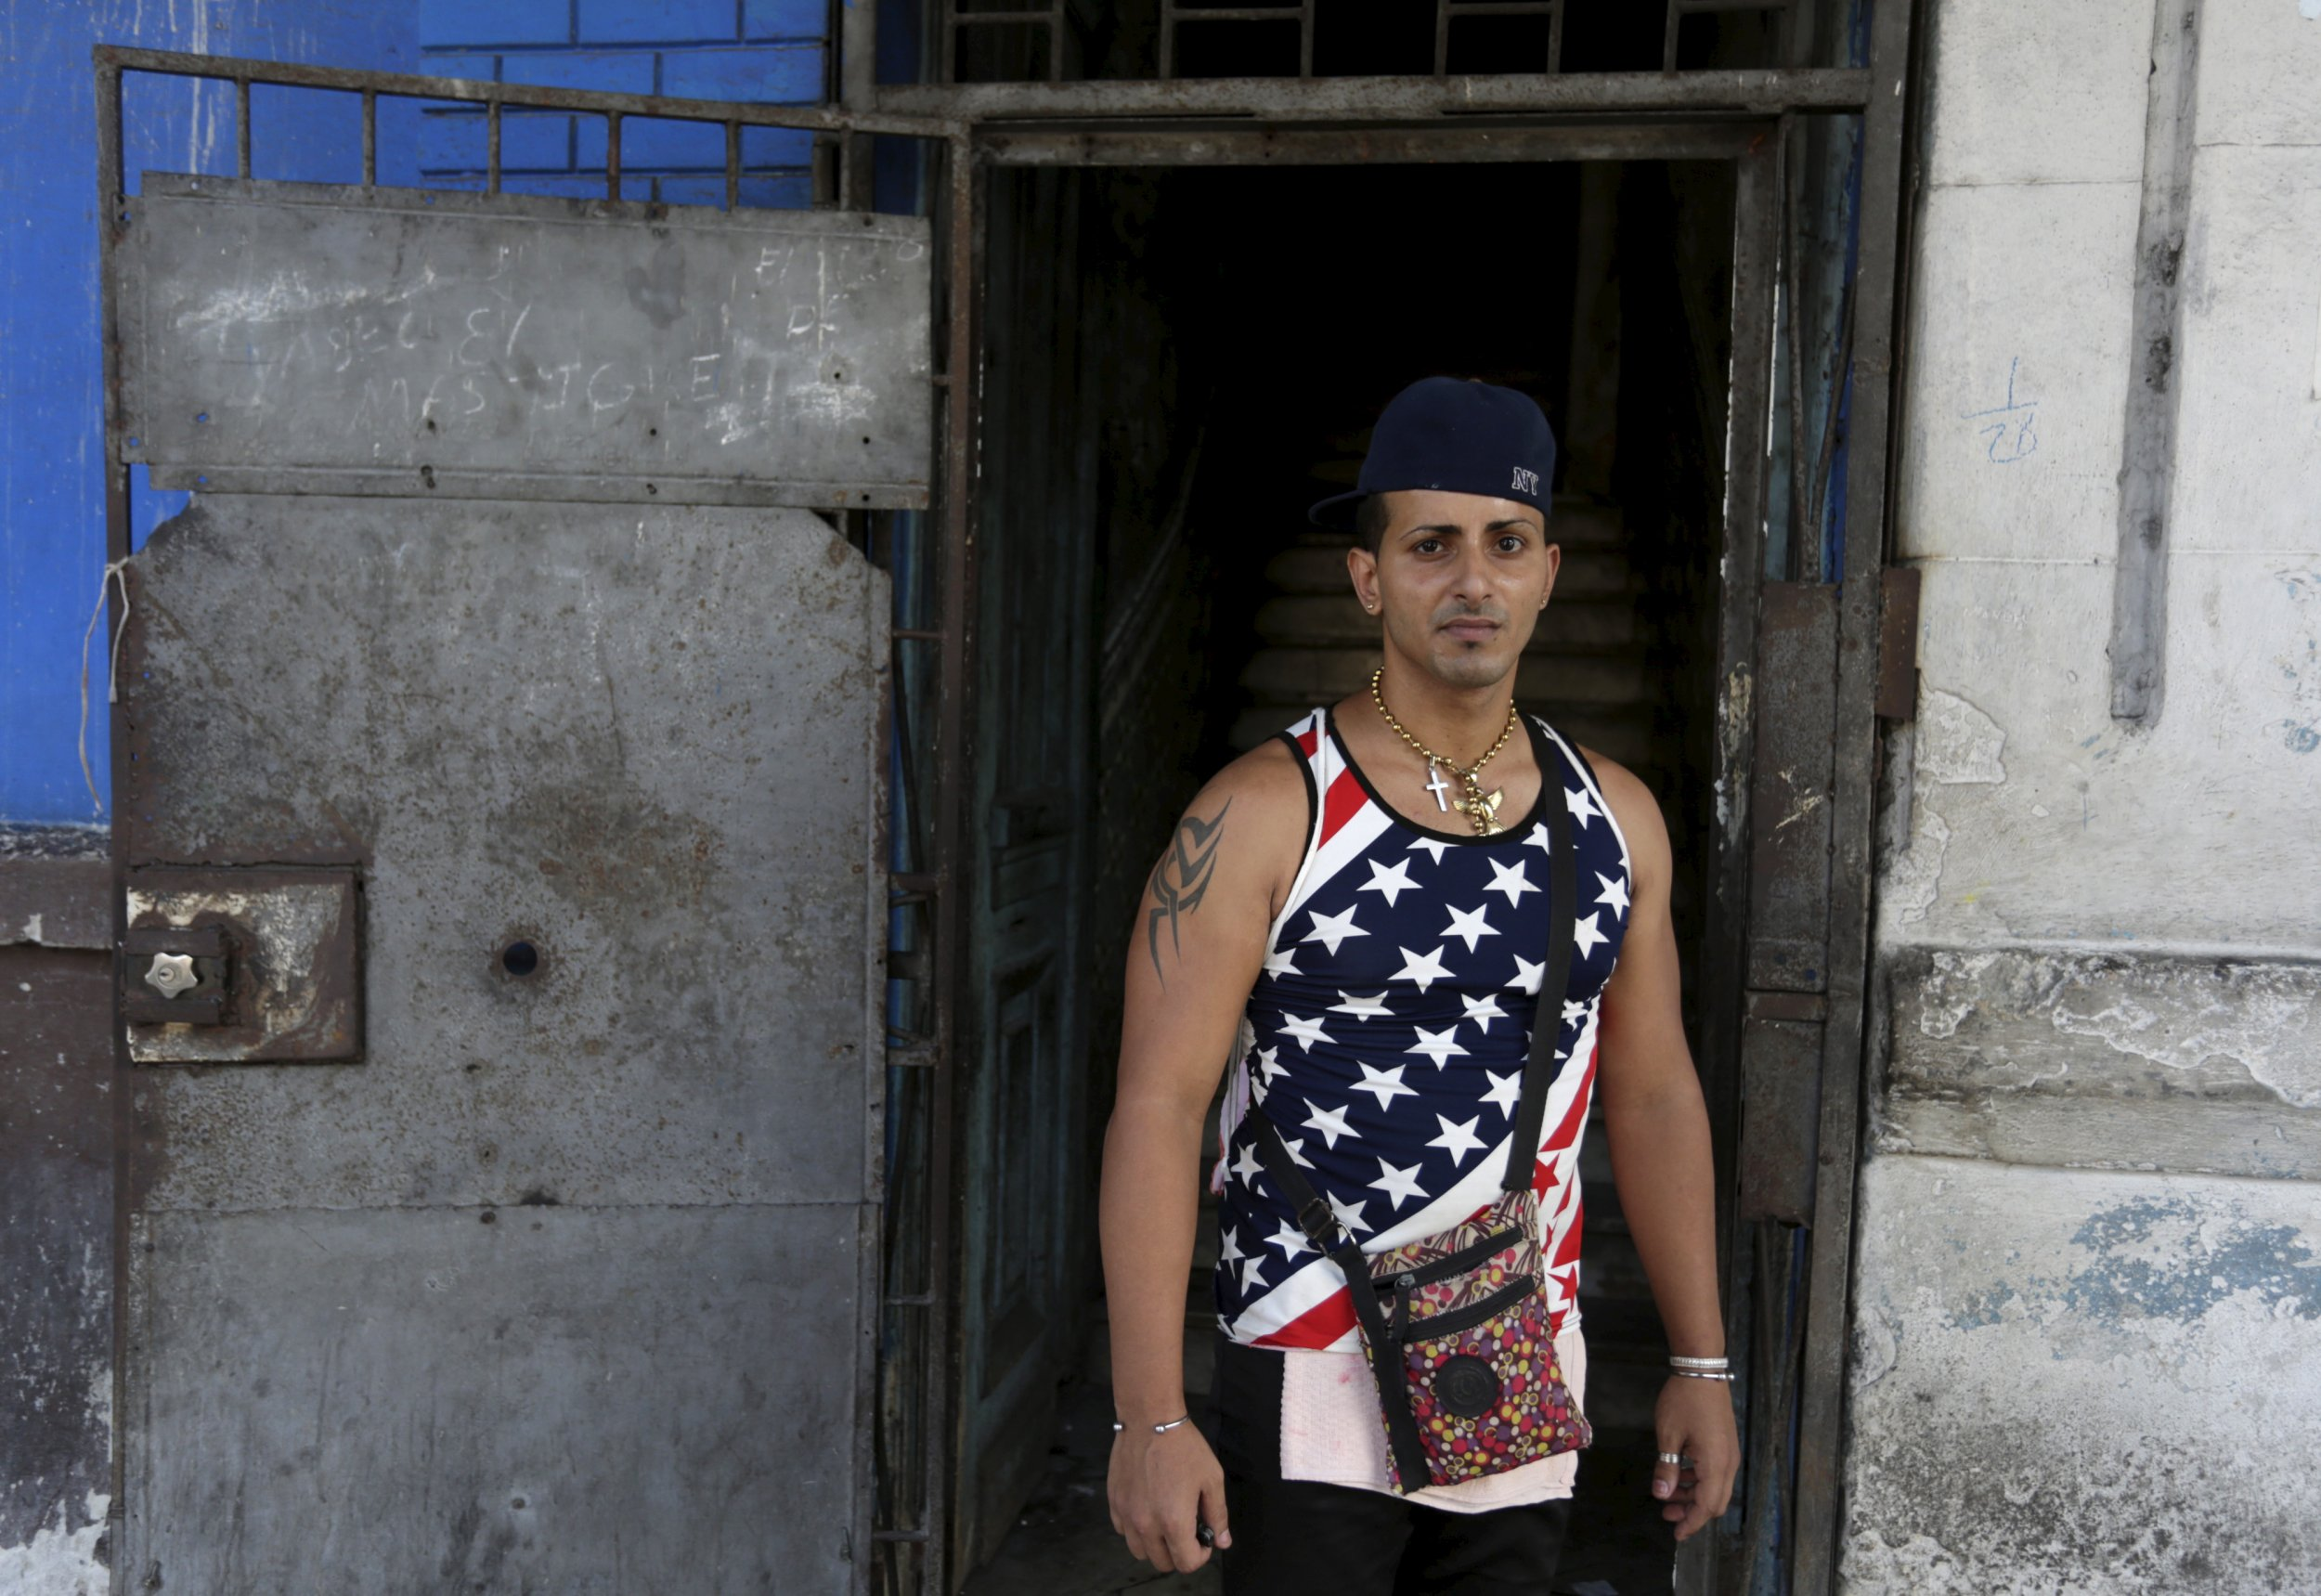 Cuba_Clinton_Embargo